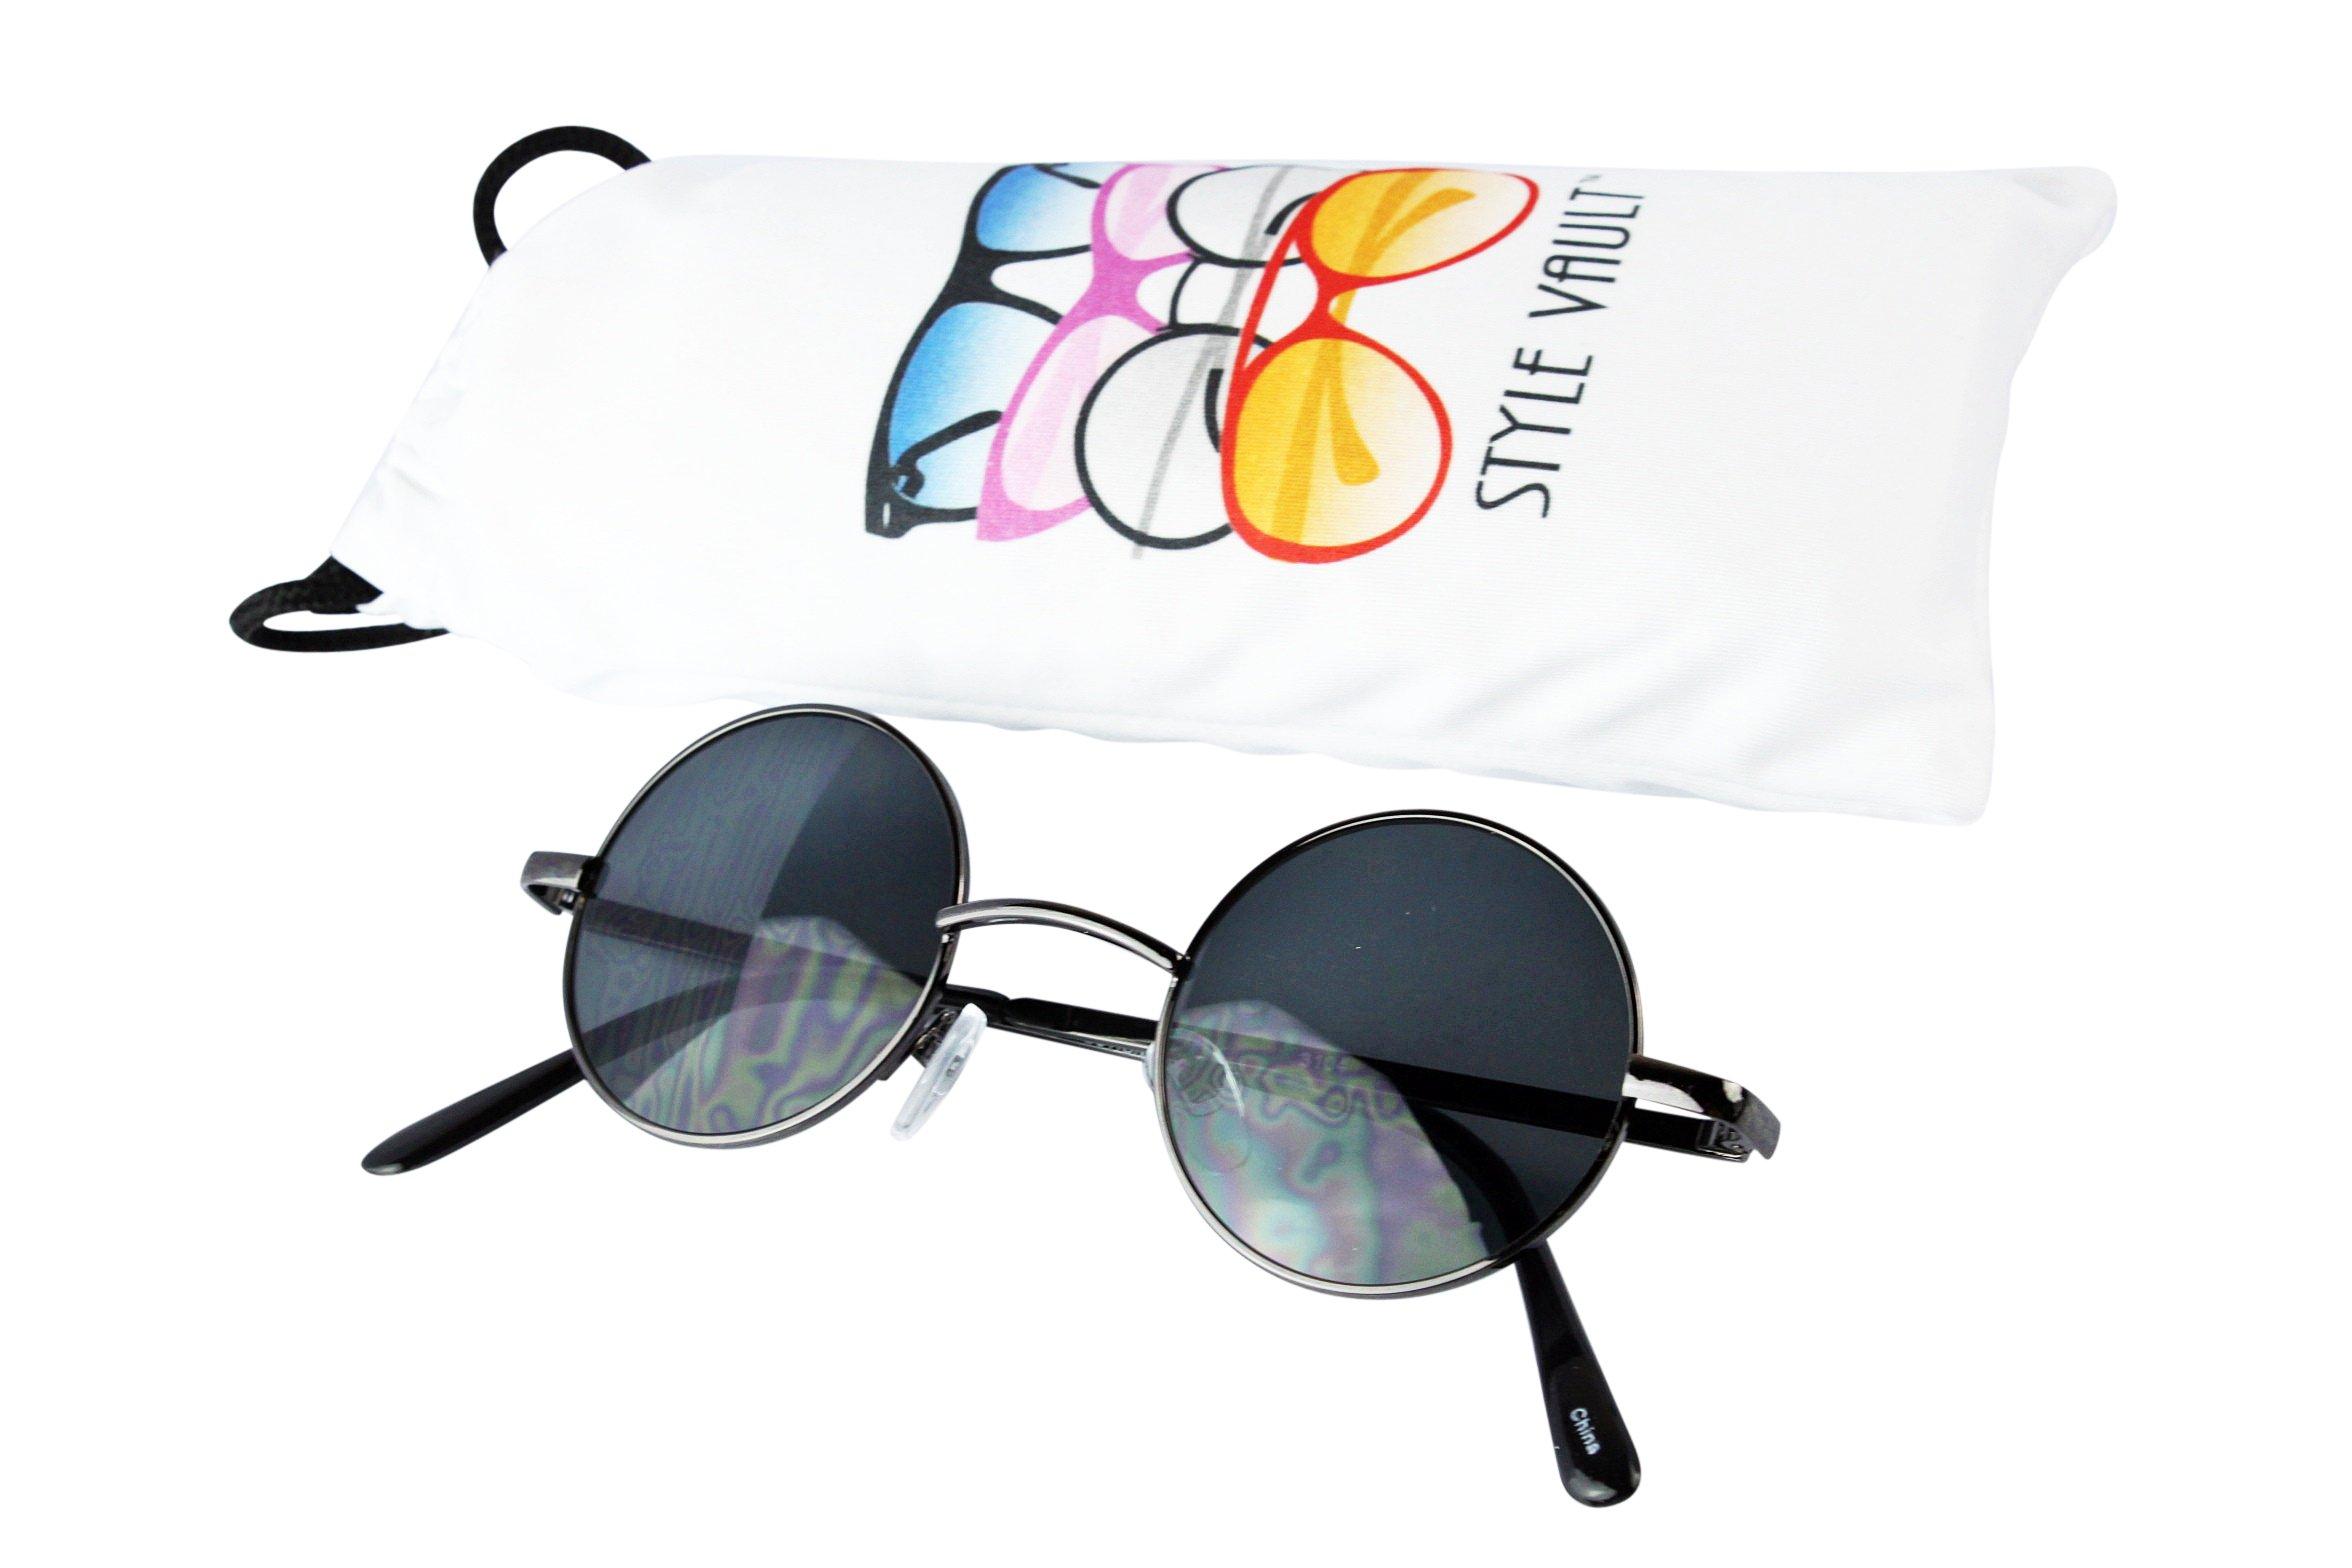 Kd244-vp Childrens (3~12 year old) Round metal Sunglasses (SPH Gunmetal-dark)